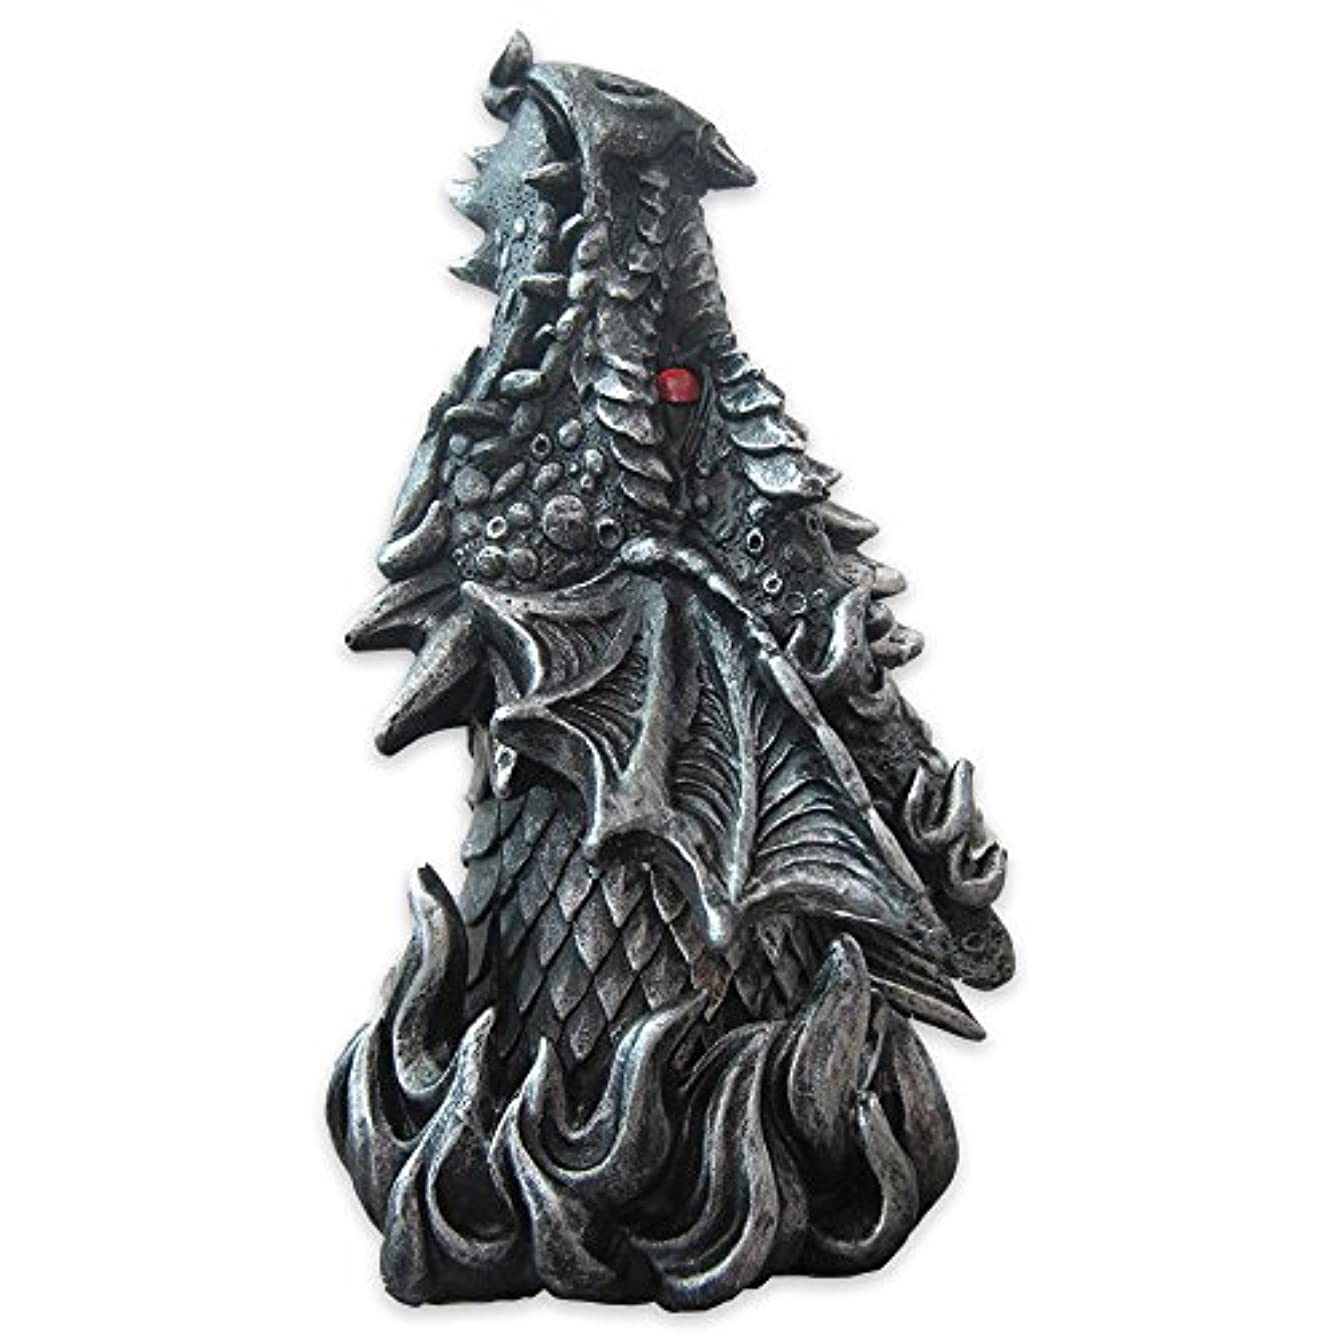 Dragon Figure Cone Incense Burner Fiery Eyes - Gothic Smoke Breathing Decor